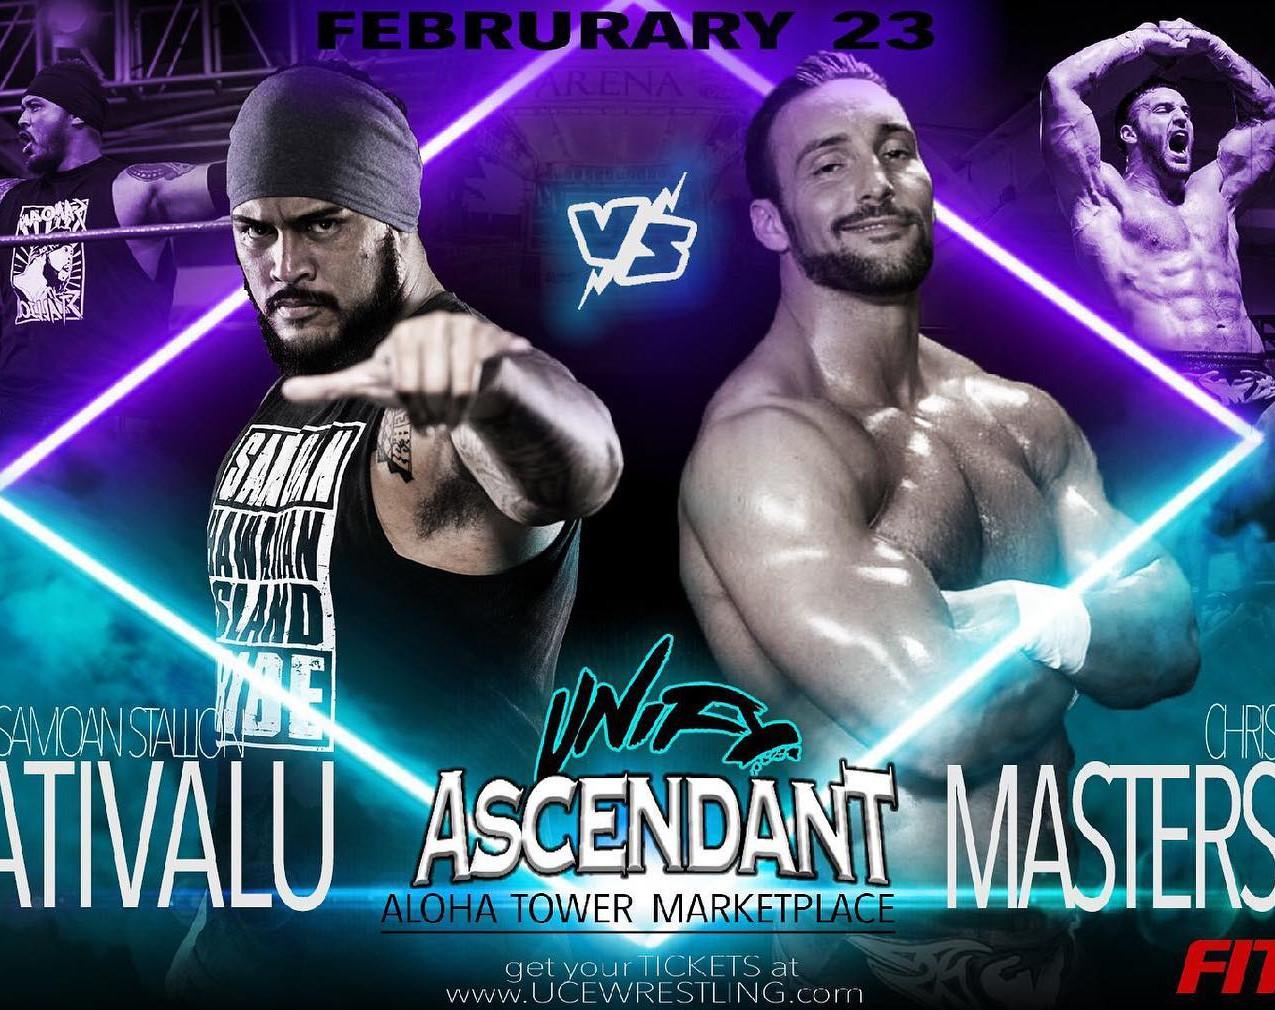 Ascendant - Ativalu vs Chris Masters